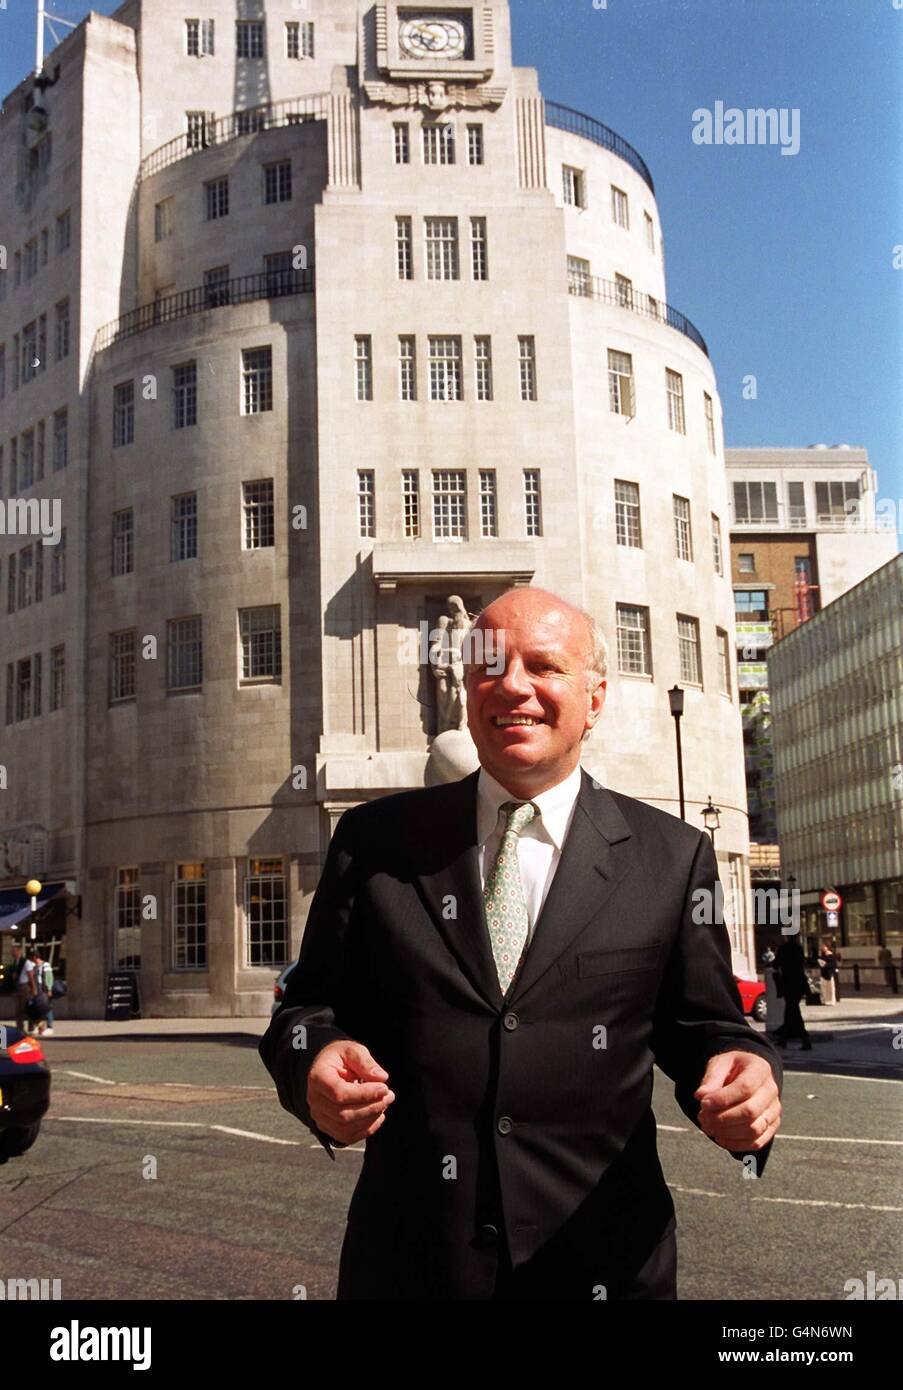 BBC/Dyke/Director General - Stock Image